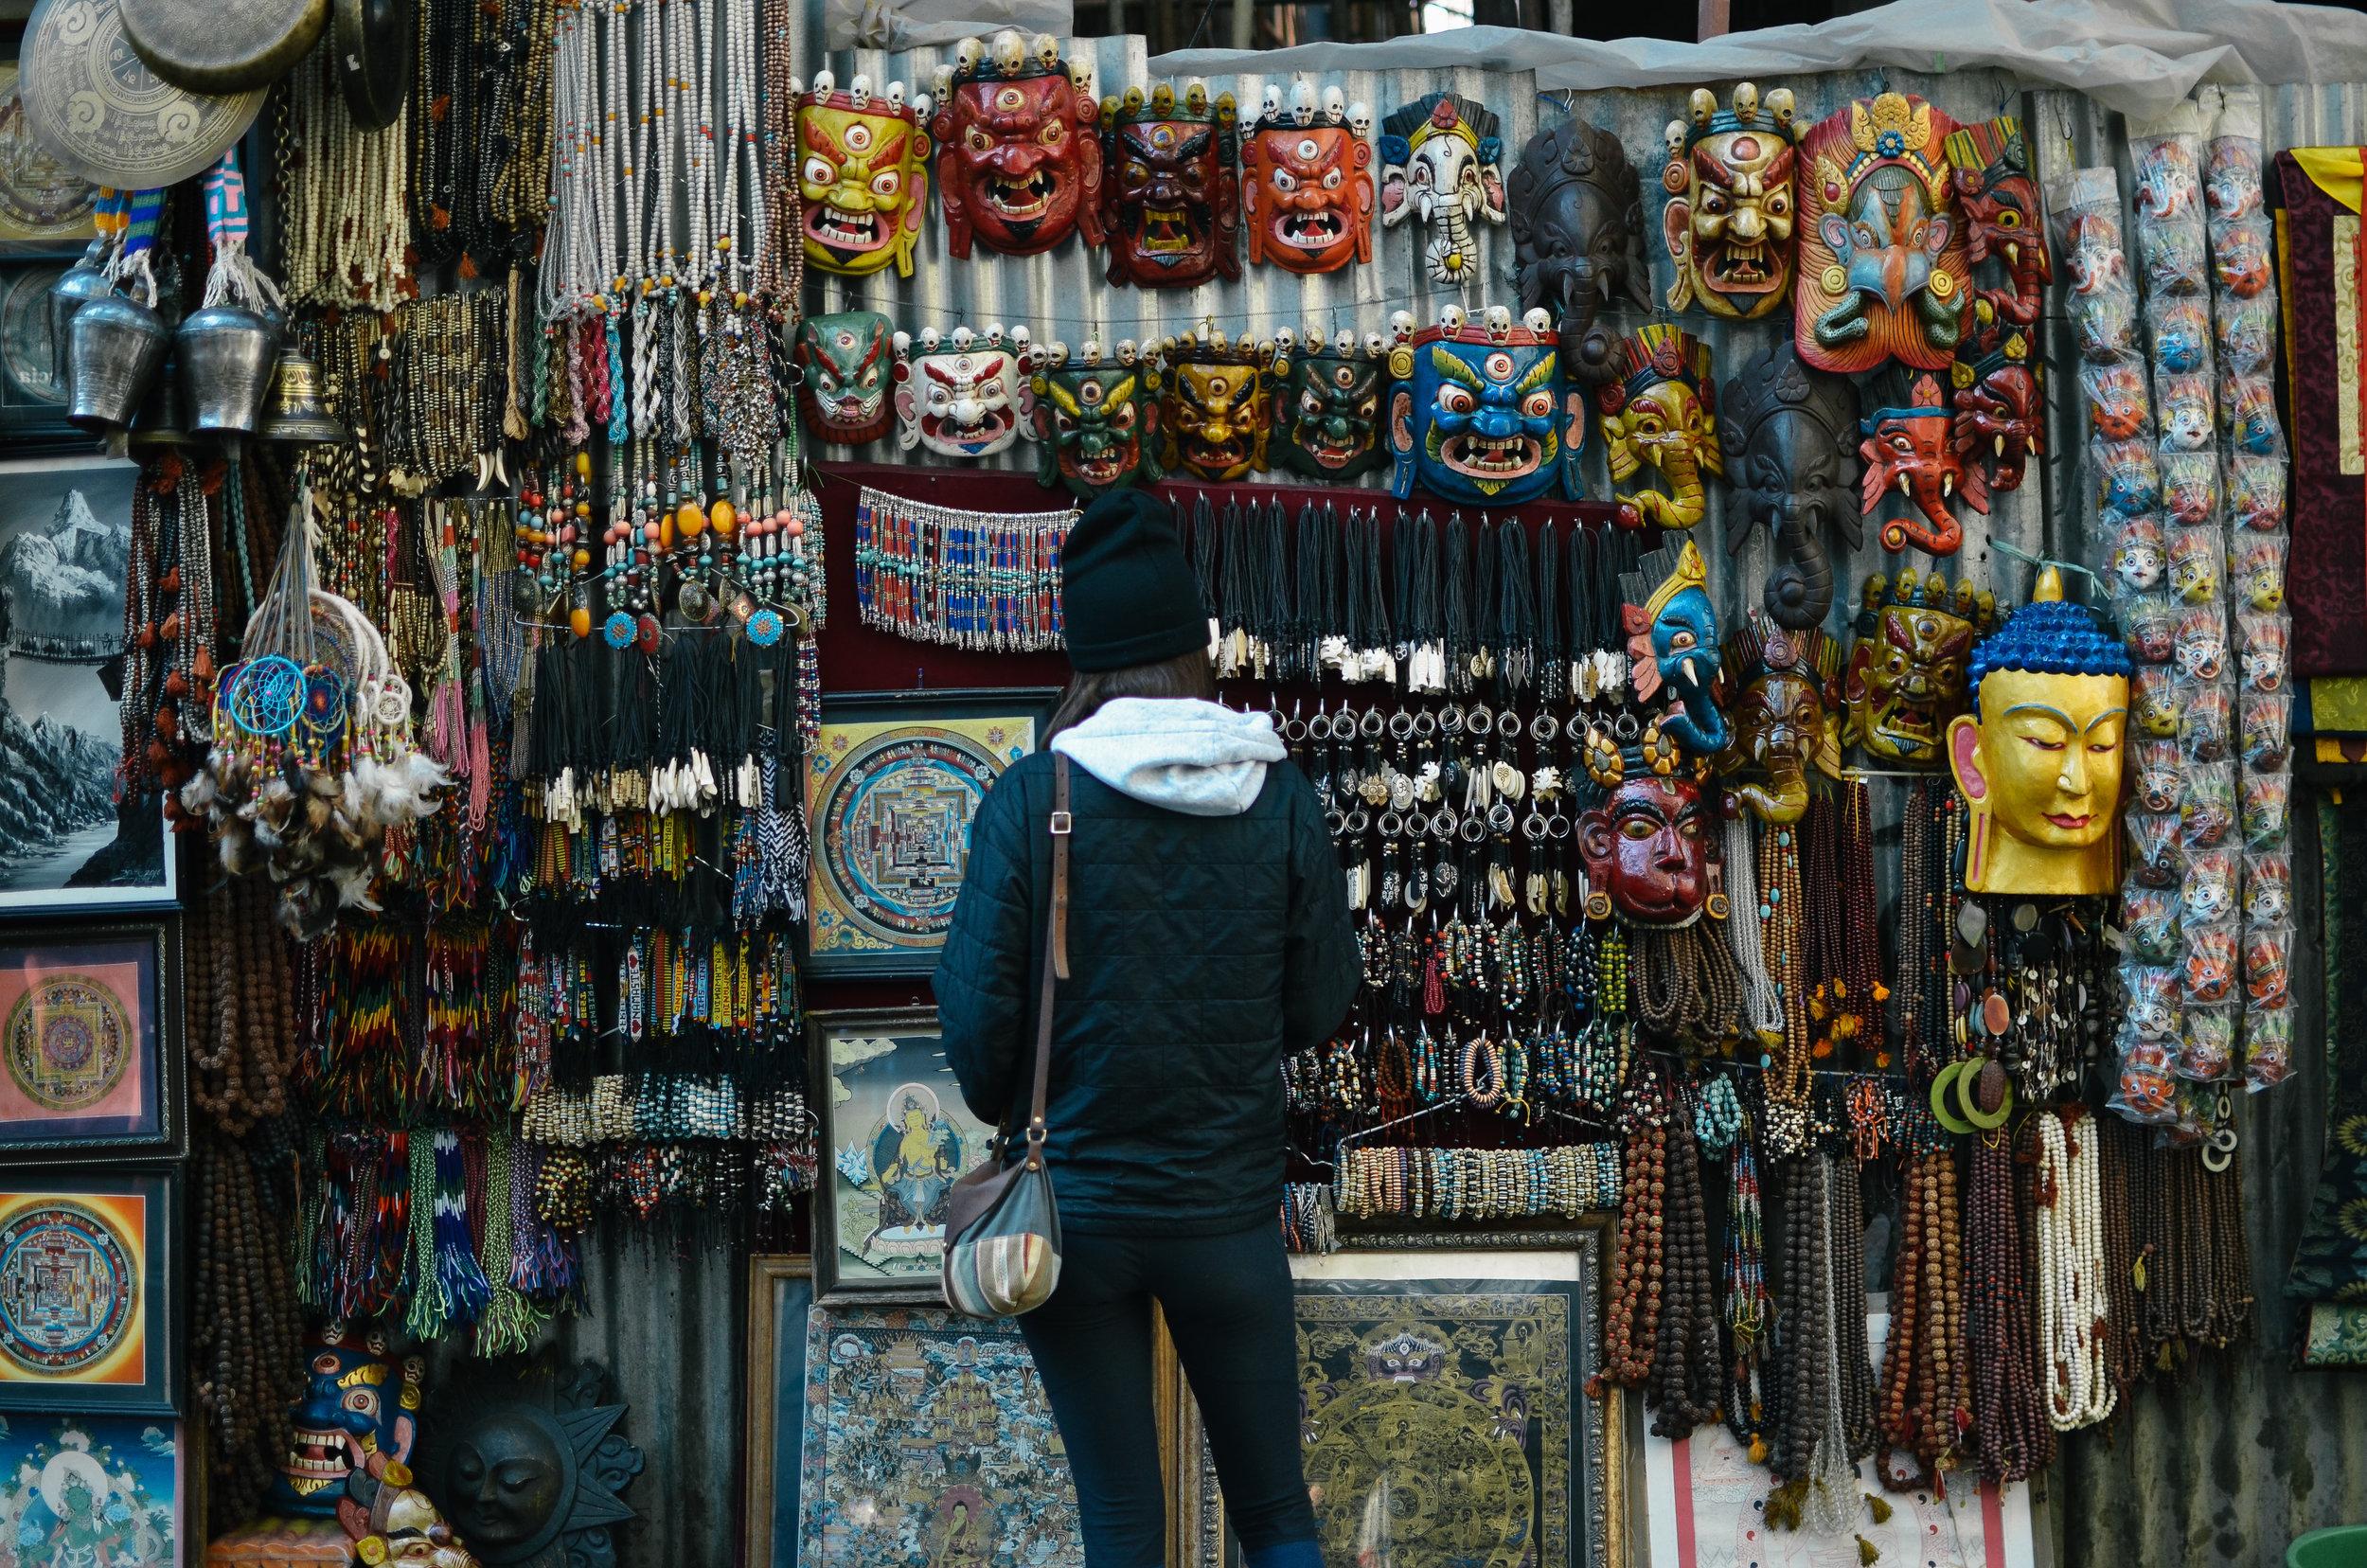 10-things-to-know-kathmandu-nepal-lifeonpine_DSC_0540.jpg